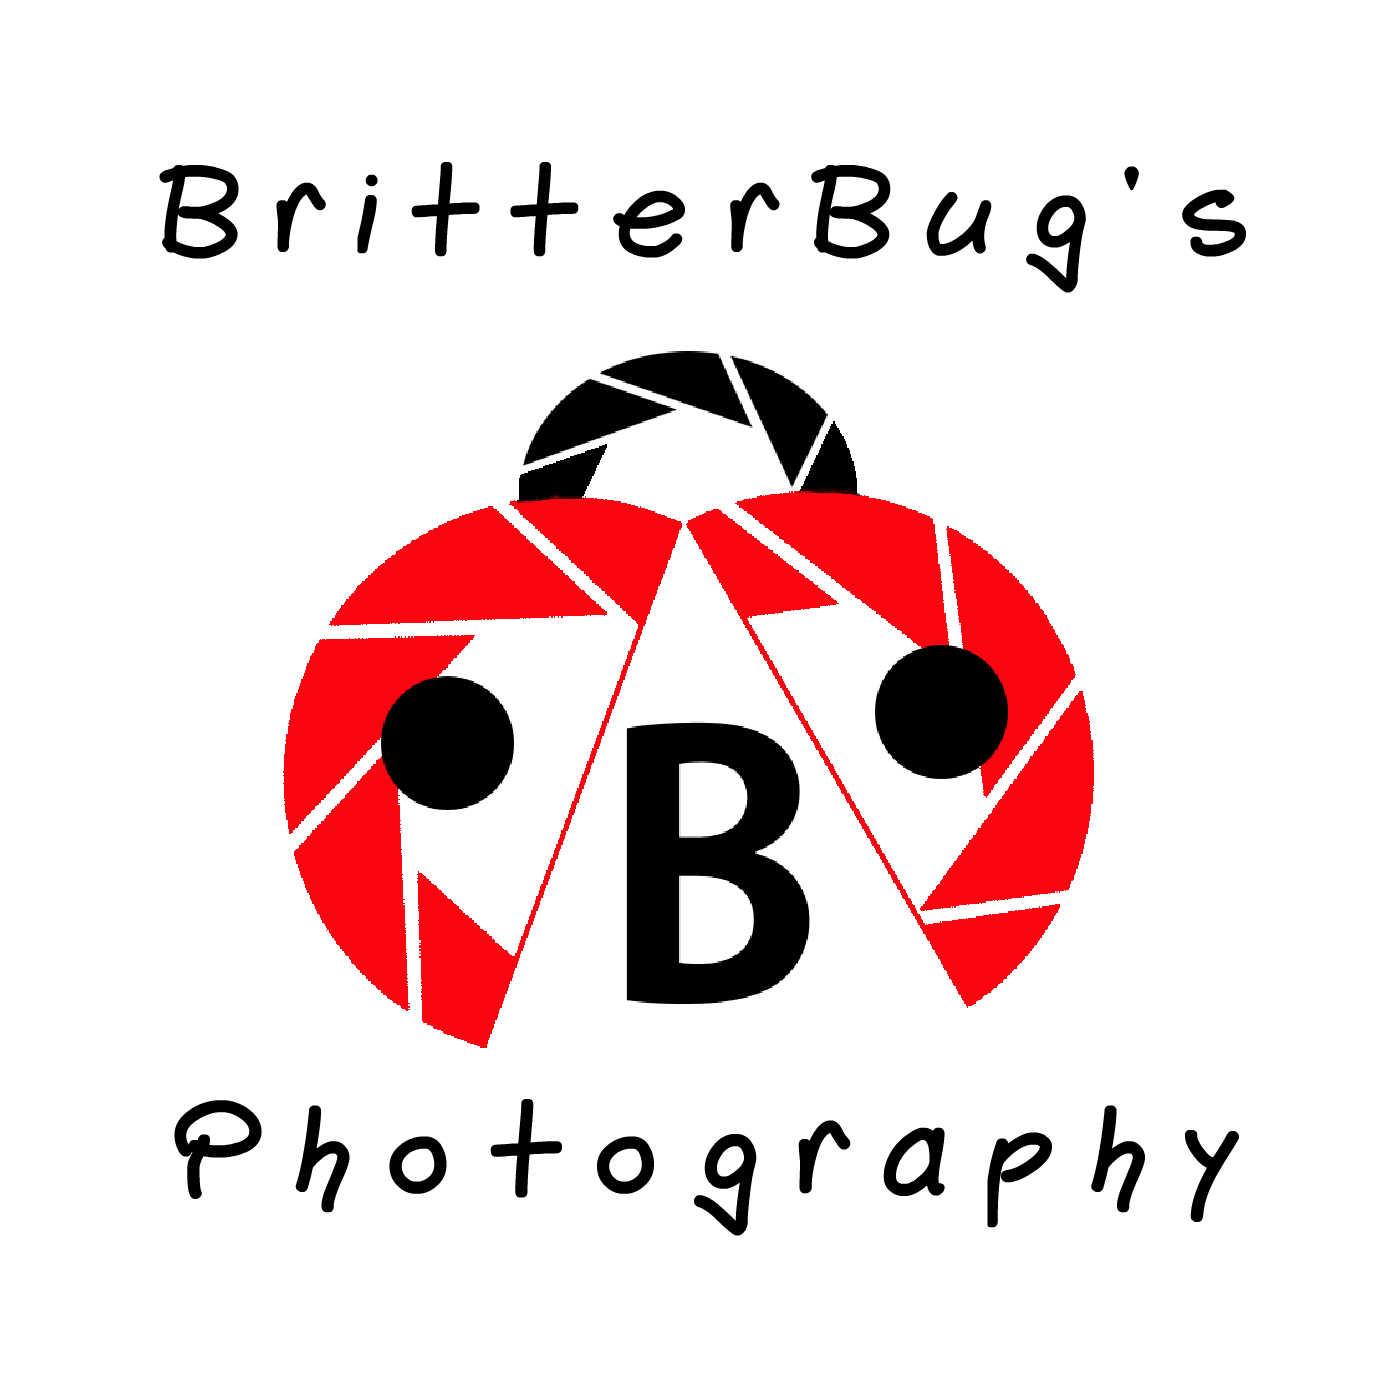 britterbugphotography's Signature